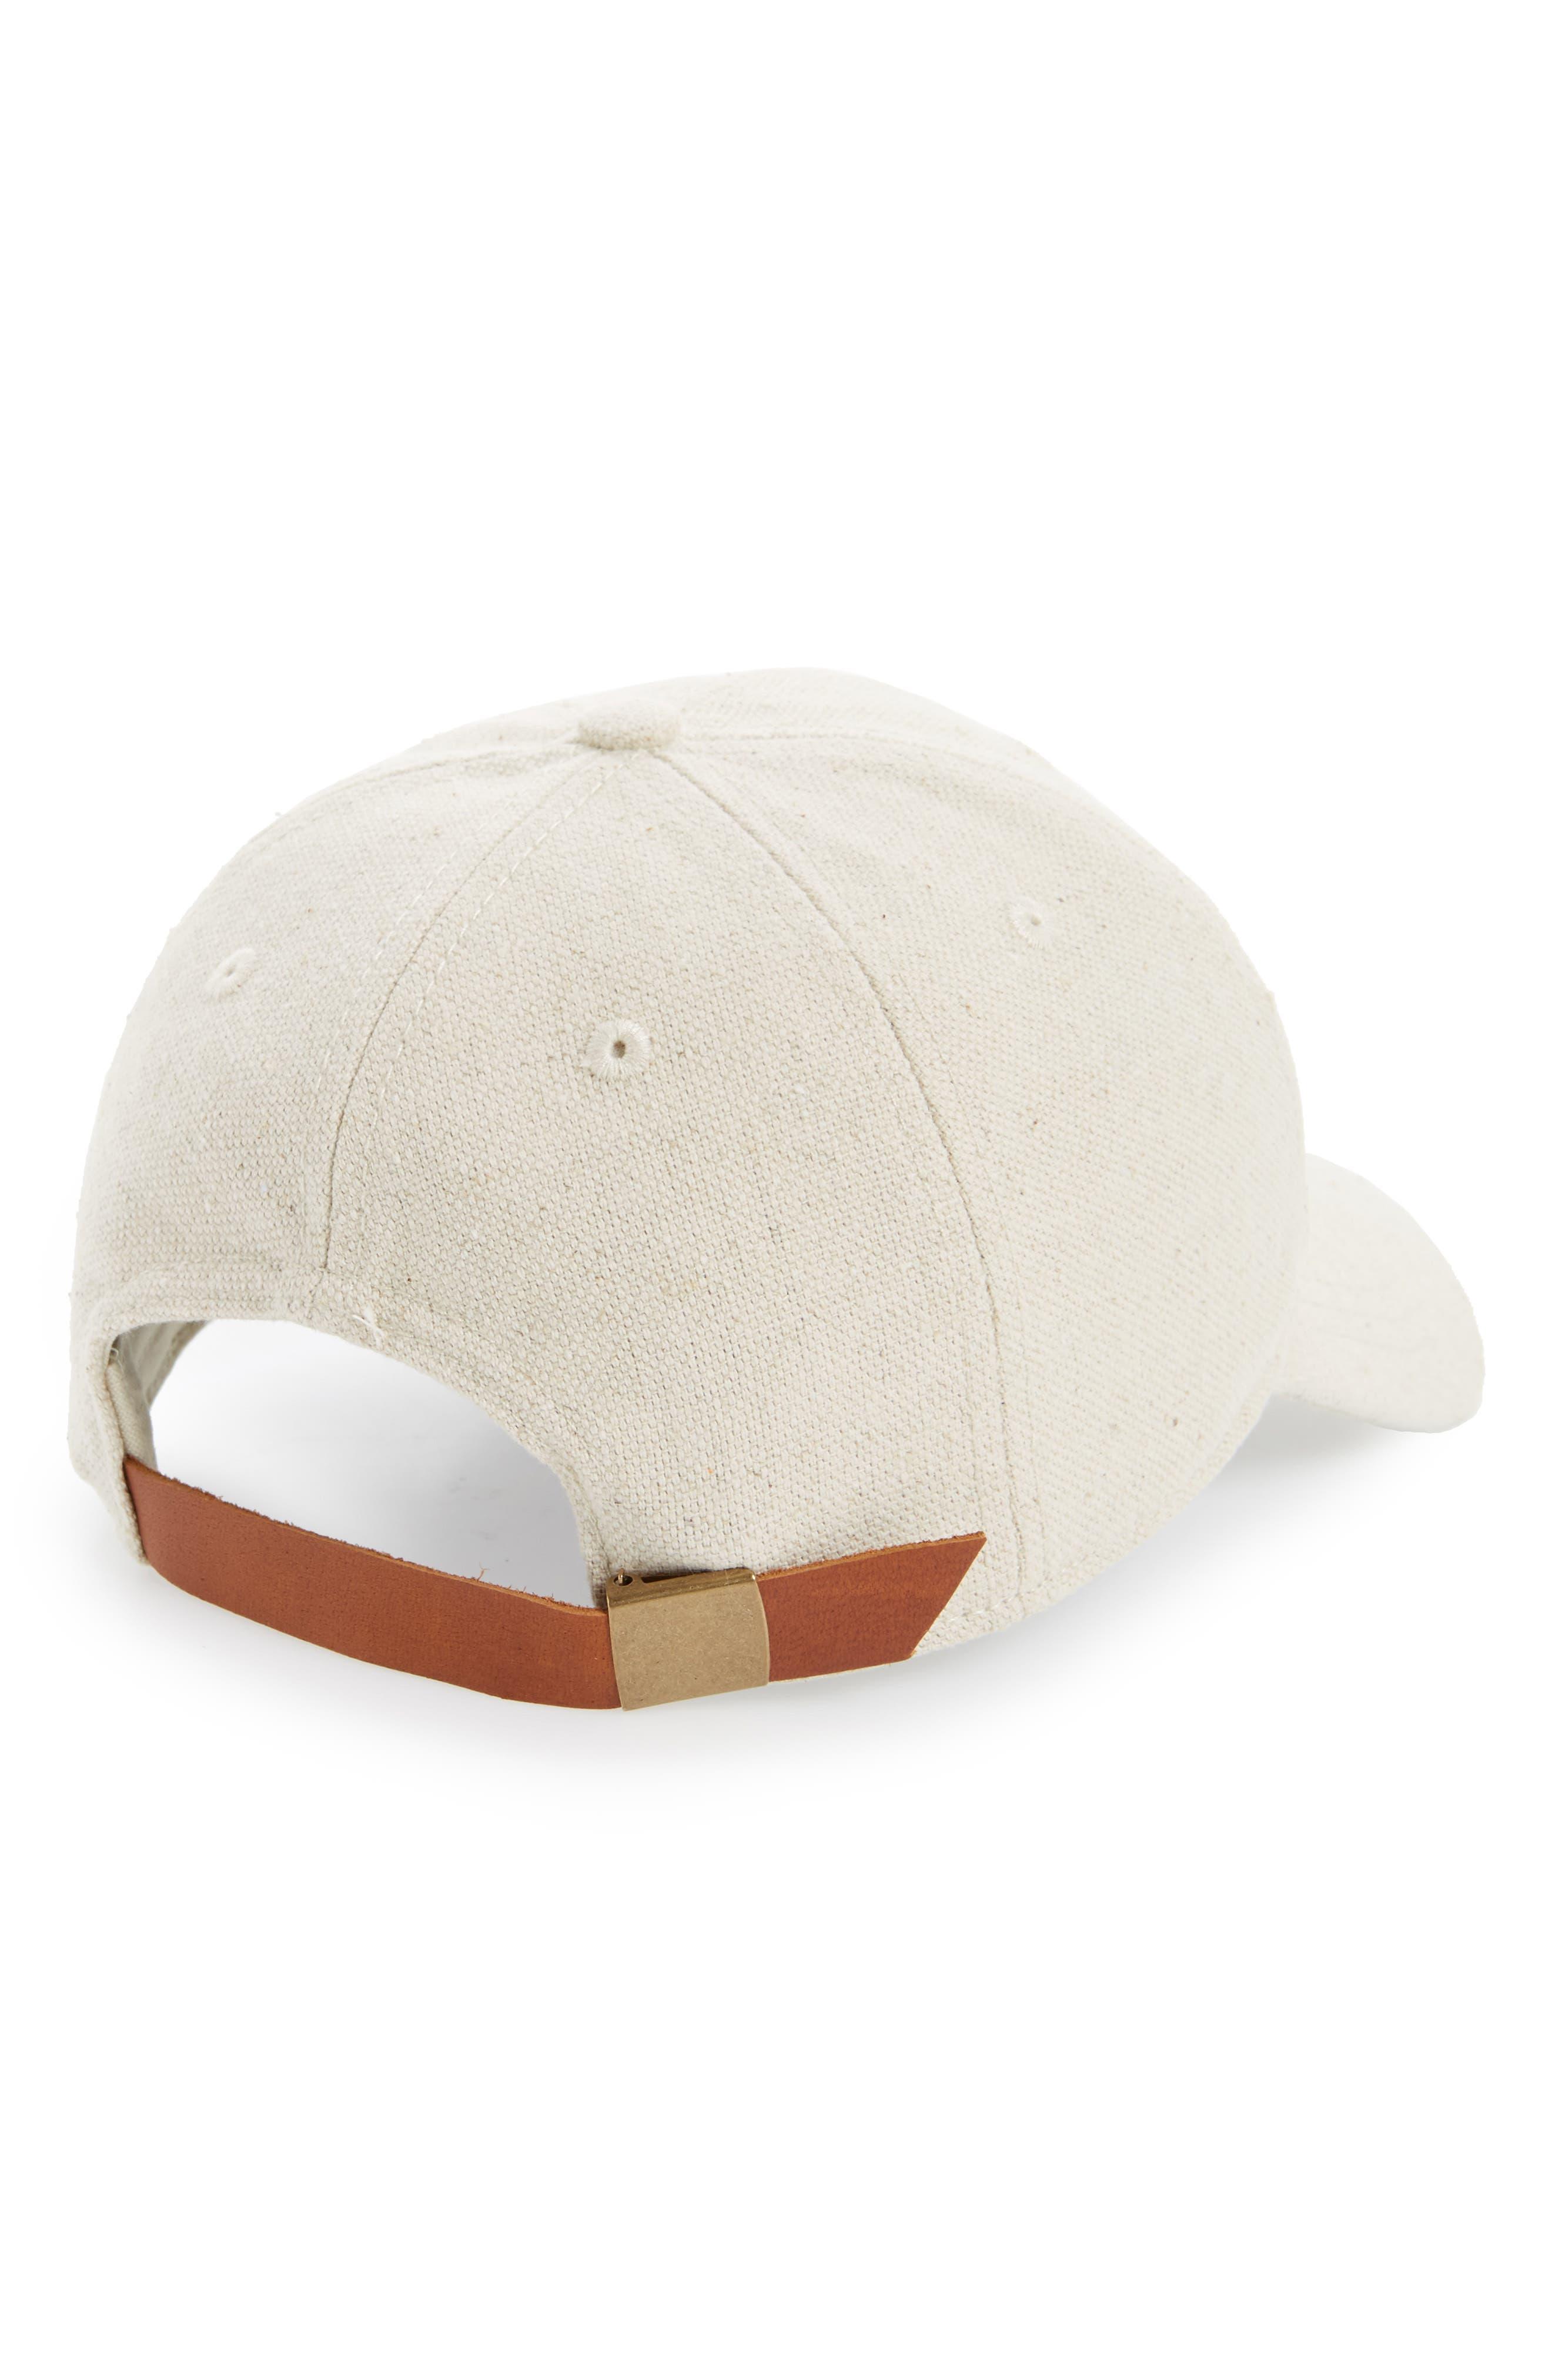 Cotton & Linen Baseball Cap,                             Alternate thumbnail 2, color,                             Canvas